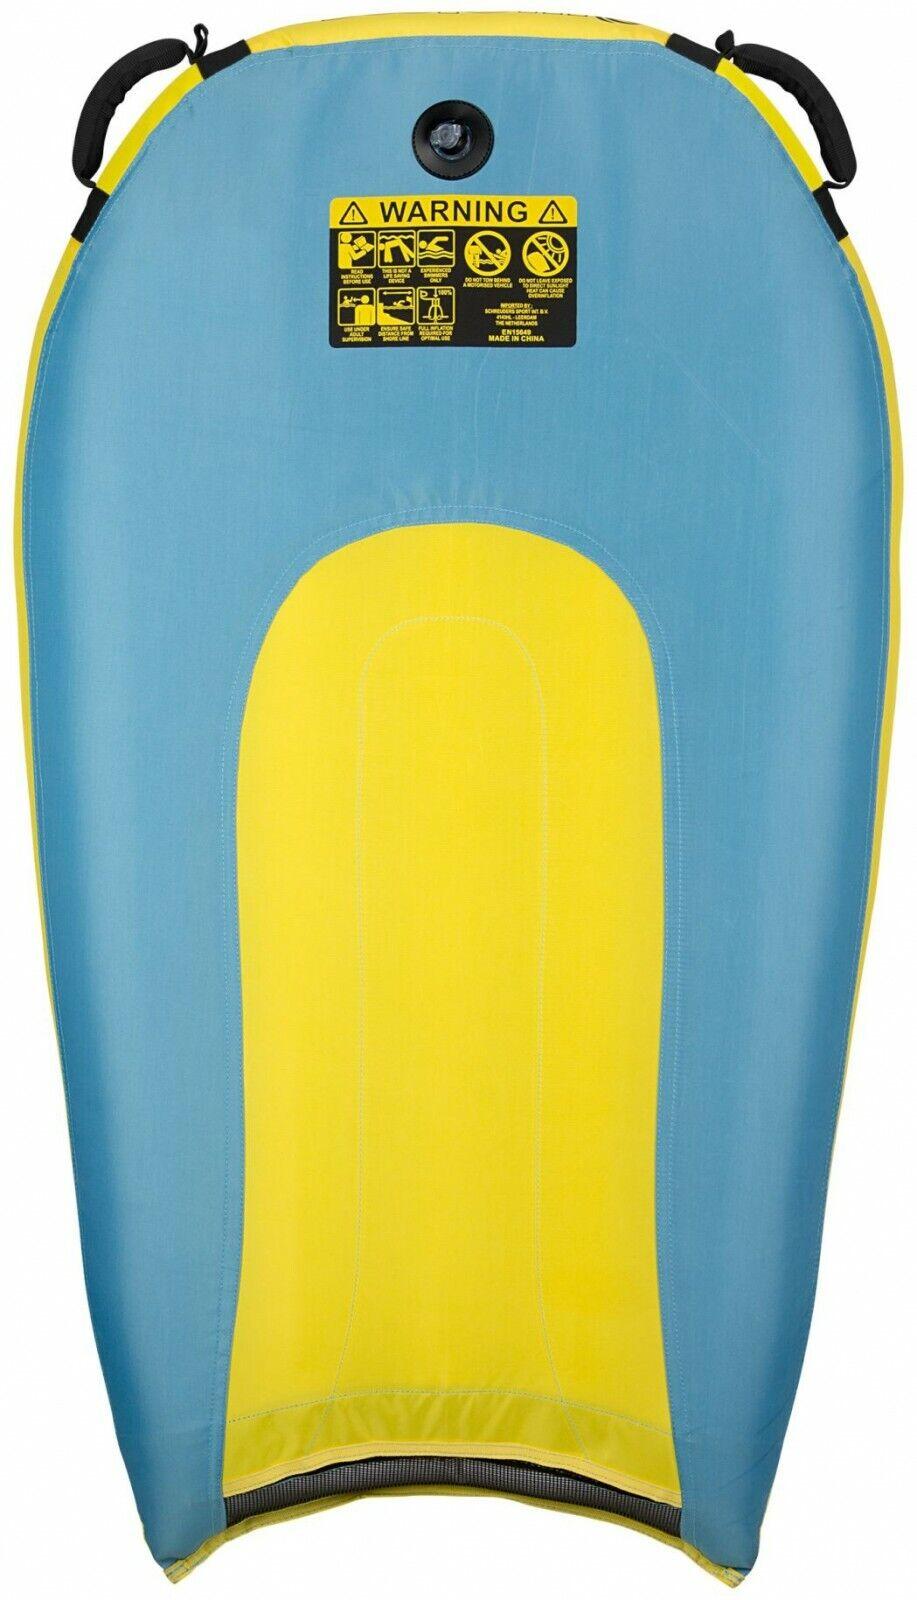 Waimea juguetes de bodyTablero 106  cm Boogie air amarillo azul negro  mejor moda